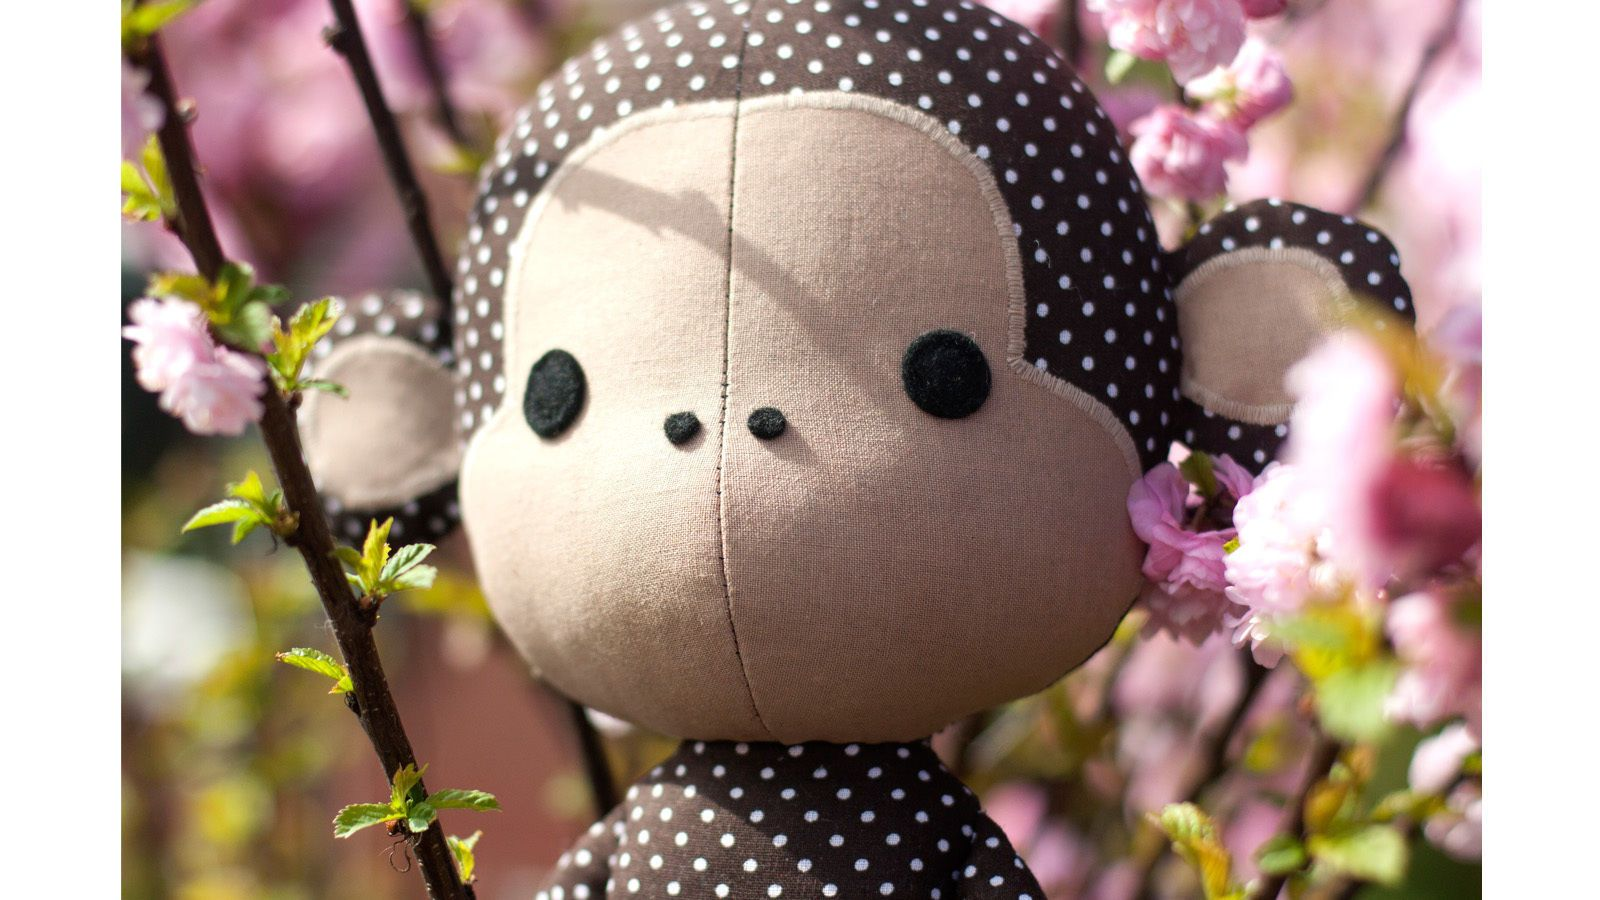 Kuscheltier Affe selber nähen Cute monkey sewing pattern - ENGLISH ...